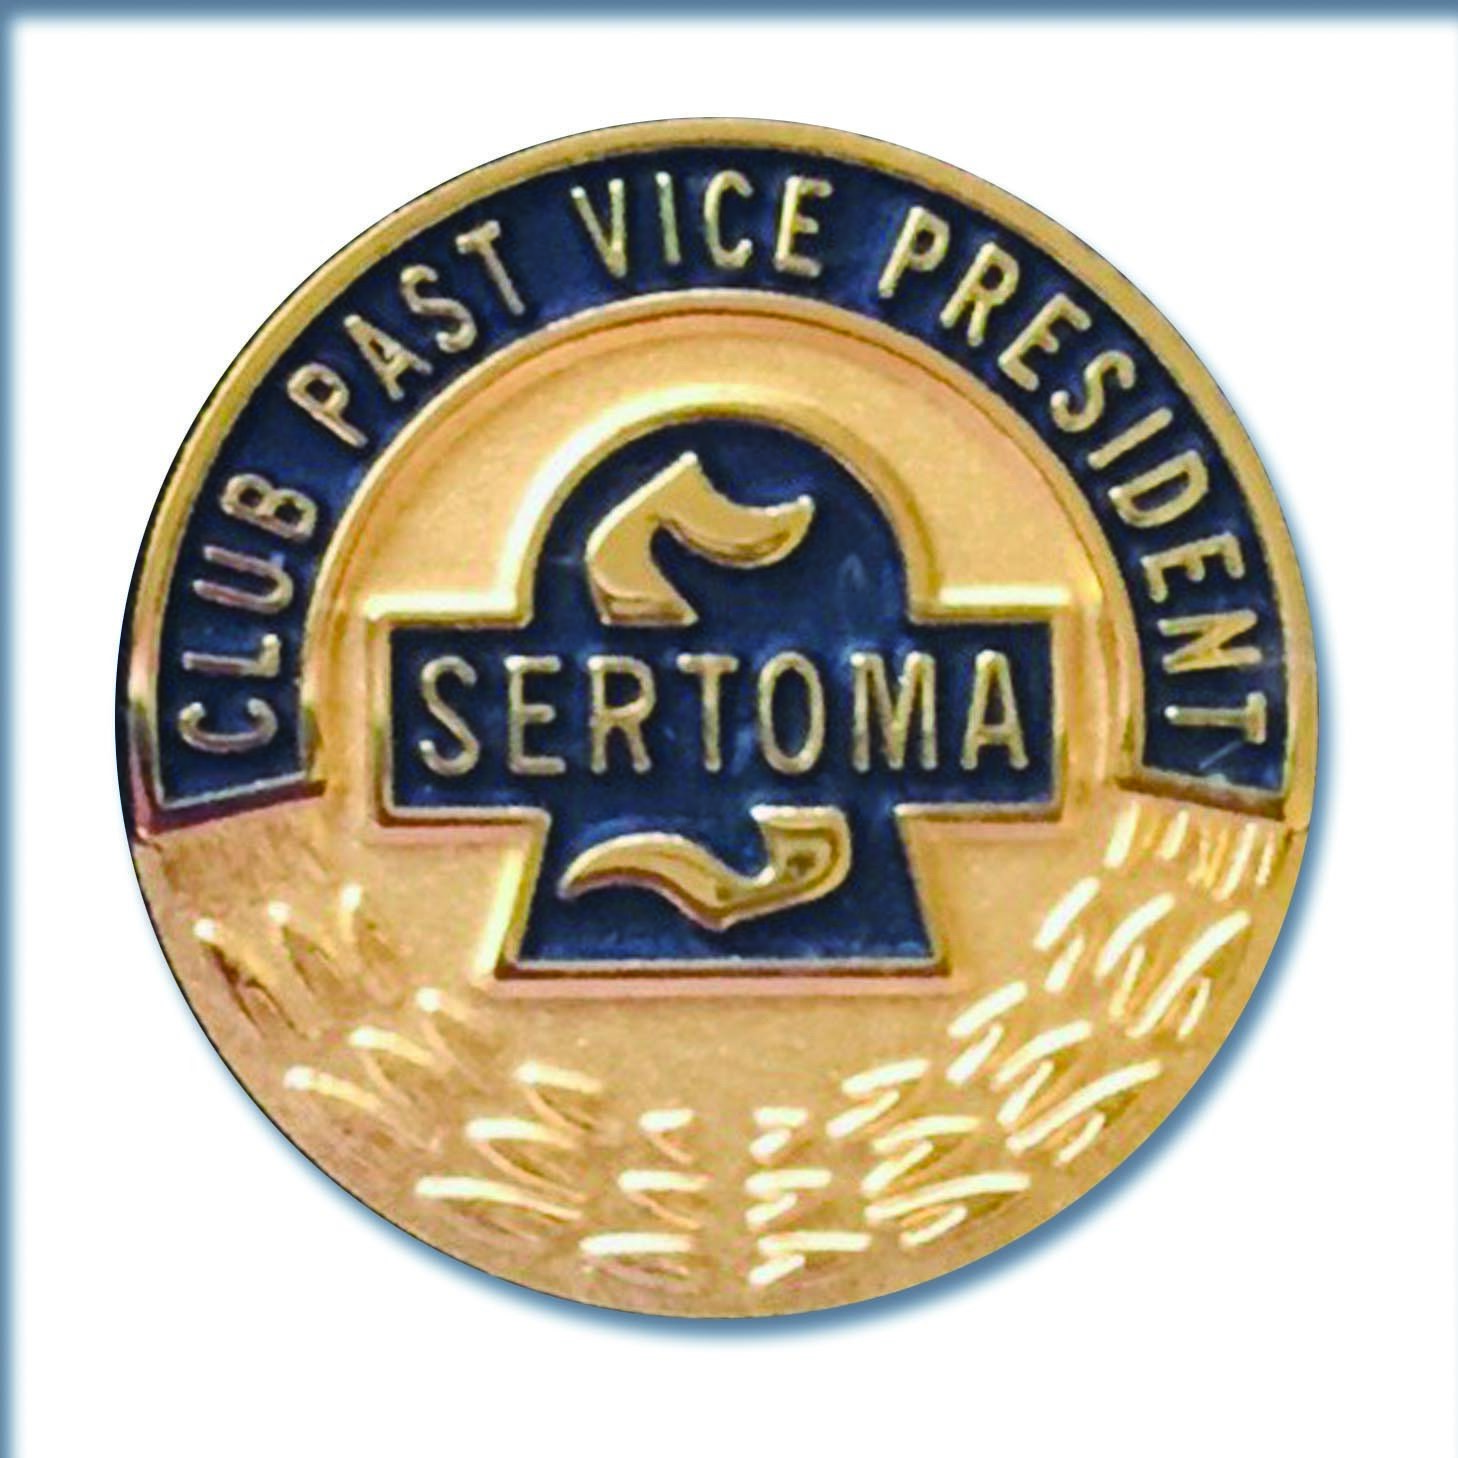 Club Past Vice President Pin